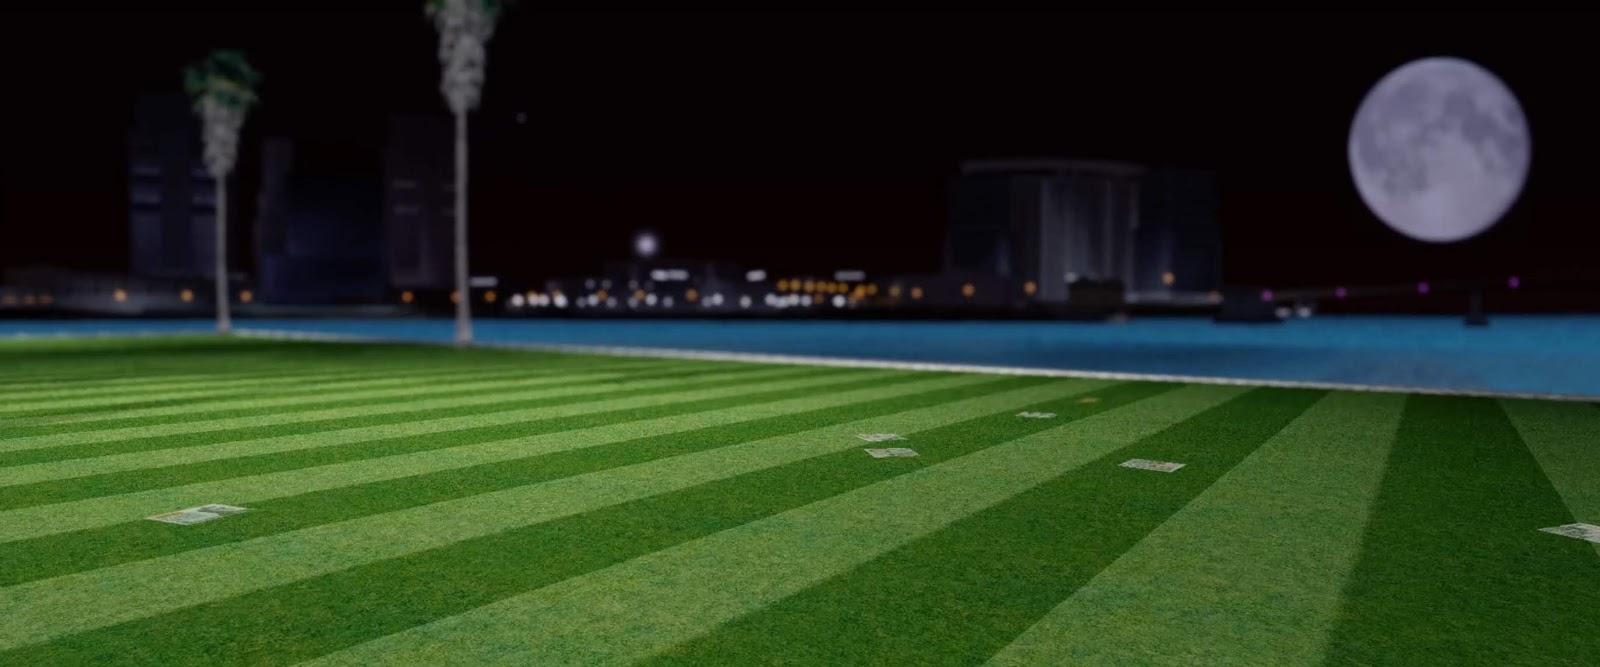 GTA Vice City CryNation | Grand Theft Auto: Vice City Ultra